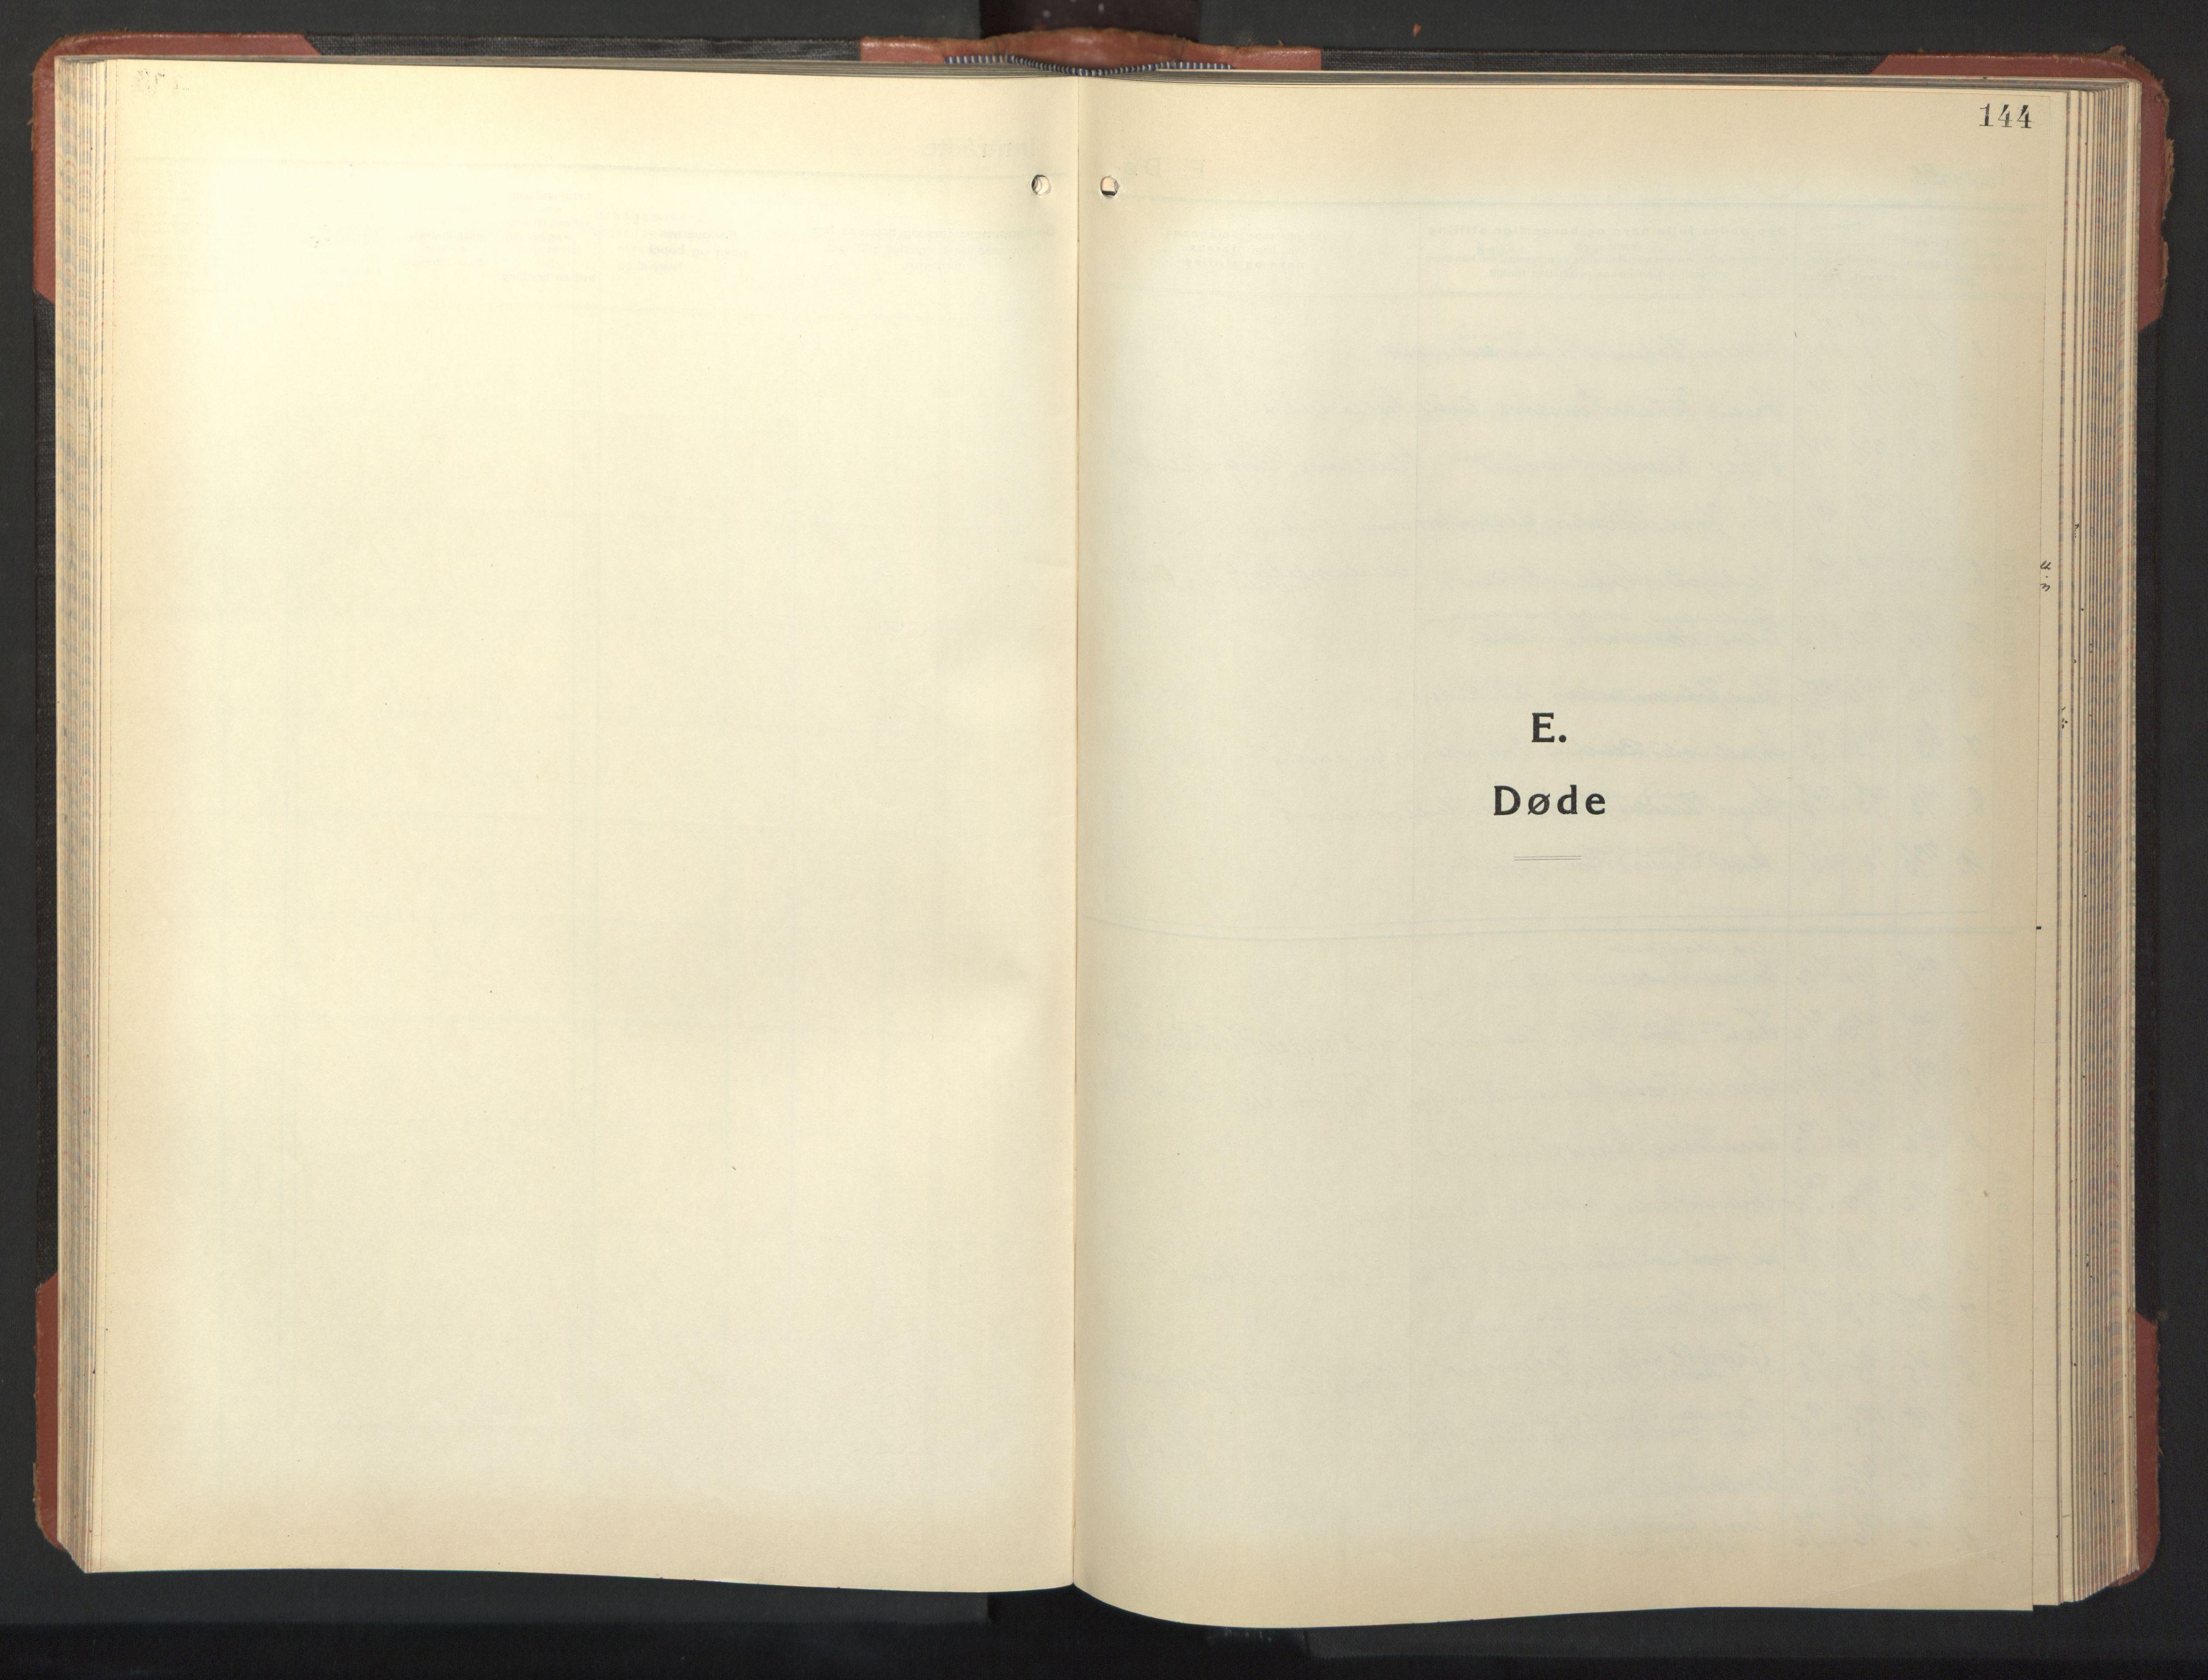 SAT, Ministerialprotokoller, klokkerbøker og fødselsregistre - Nordland, 801/L0038: Klokkerbok nr. 801C13, 1935-1951, s. 144